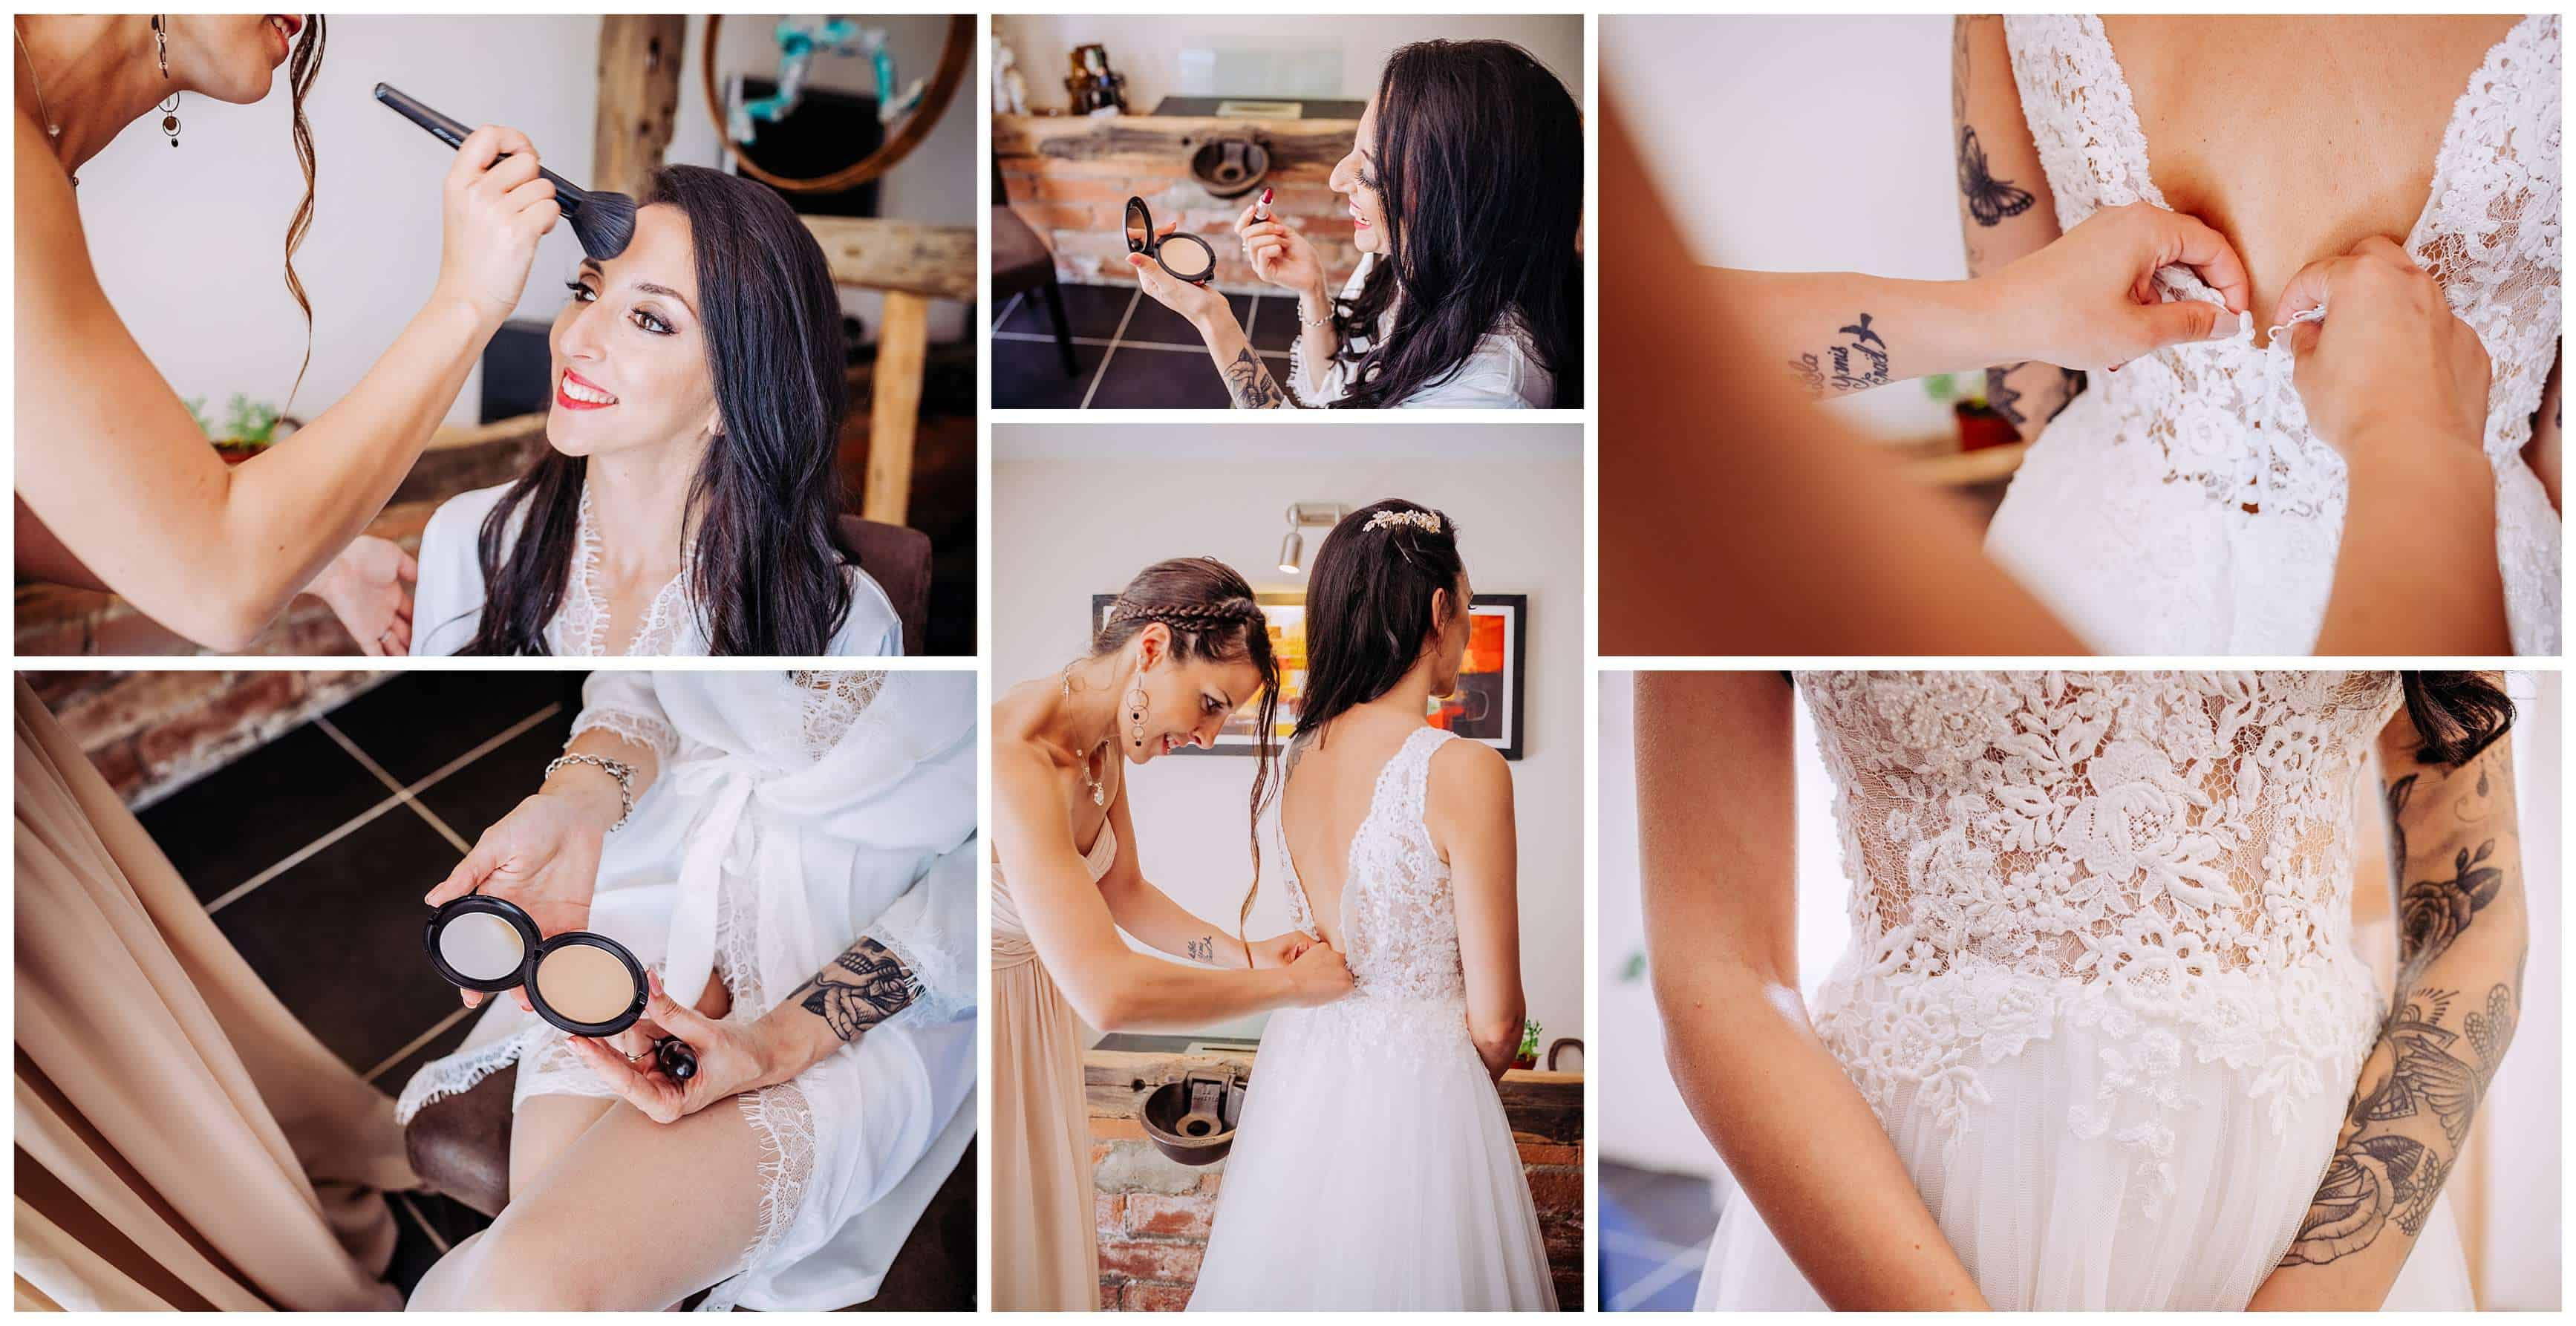 photographe mariage cool prrparatif